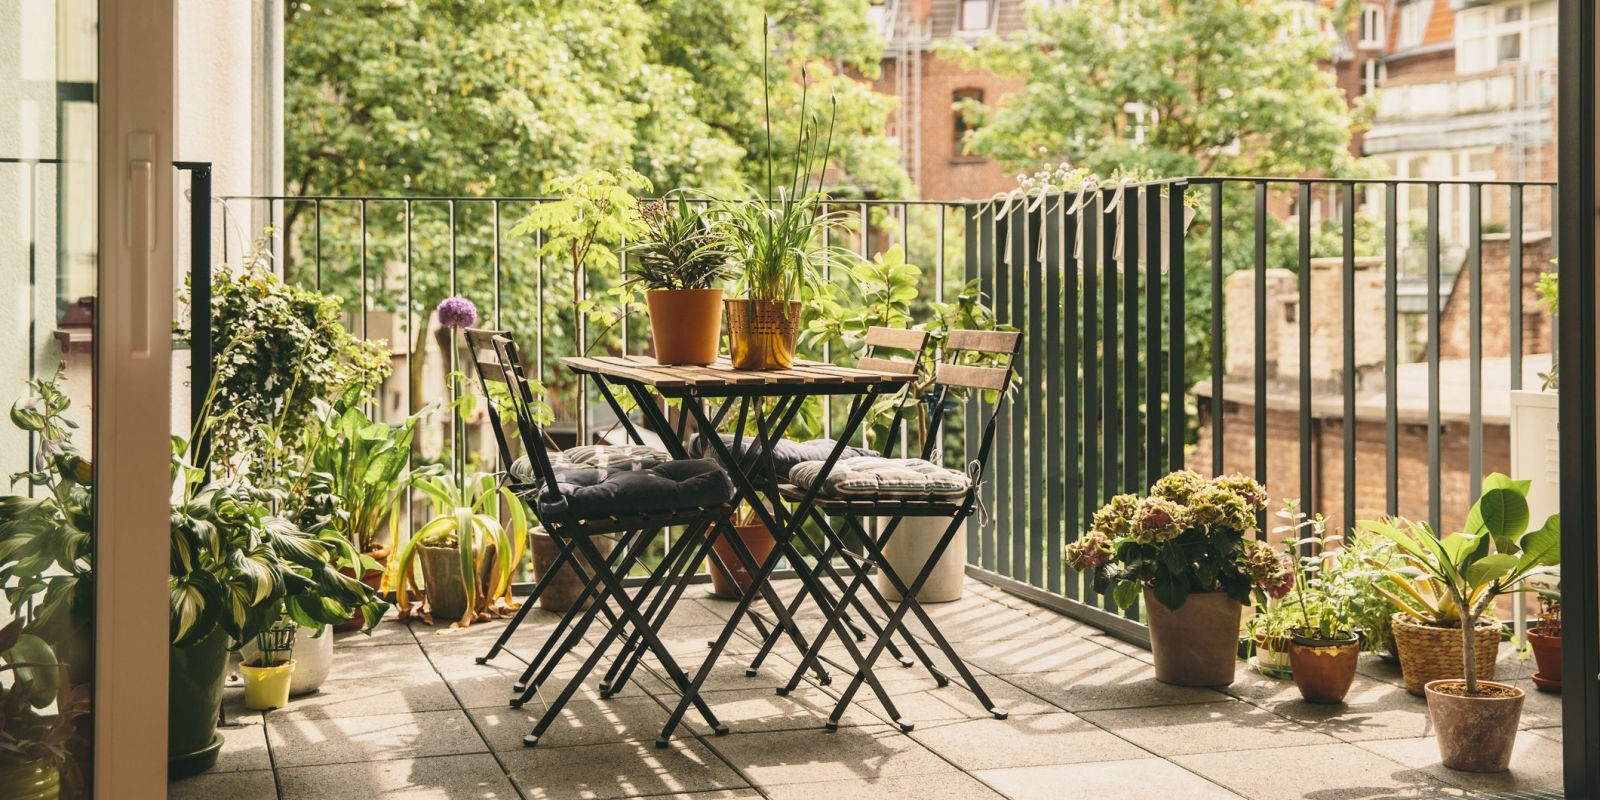 ▷über 1000 Balkonmöbel - Gartenmöbel aus Polyrattan, Lounge Möbel ...